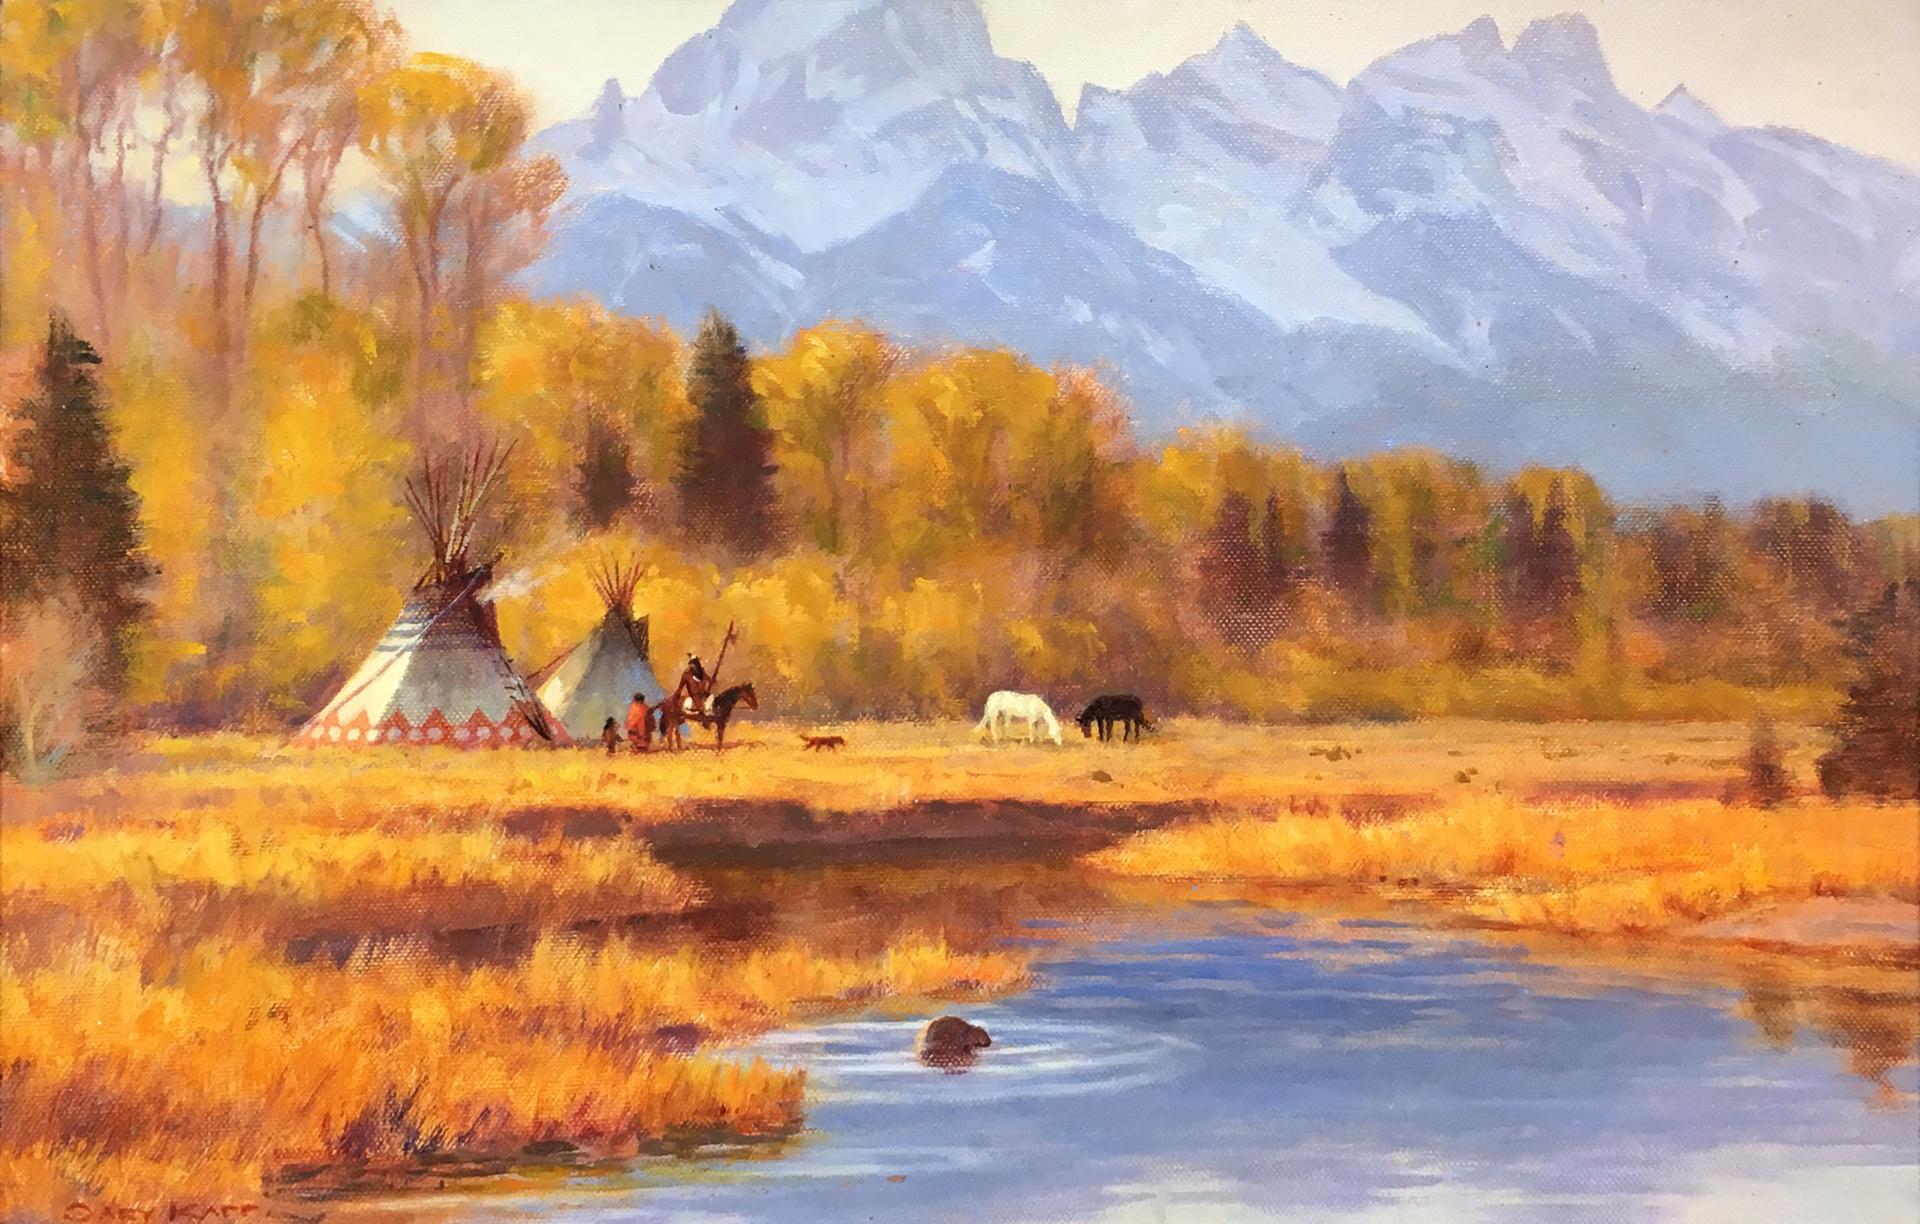 An Early Fall by Gary Kapp